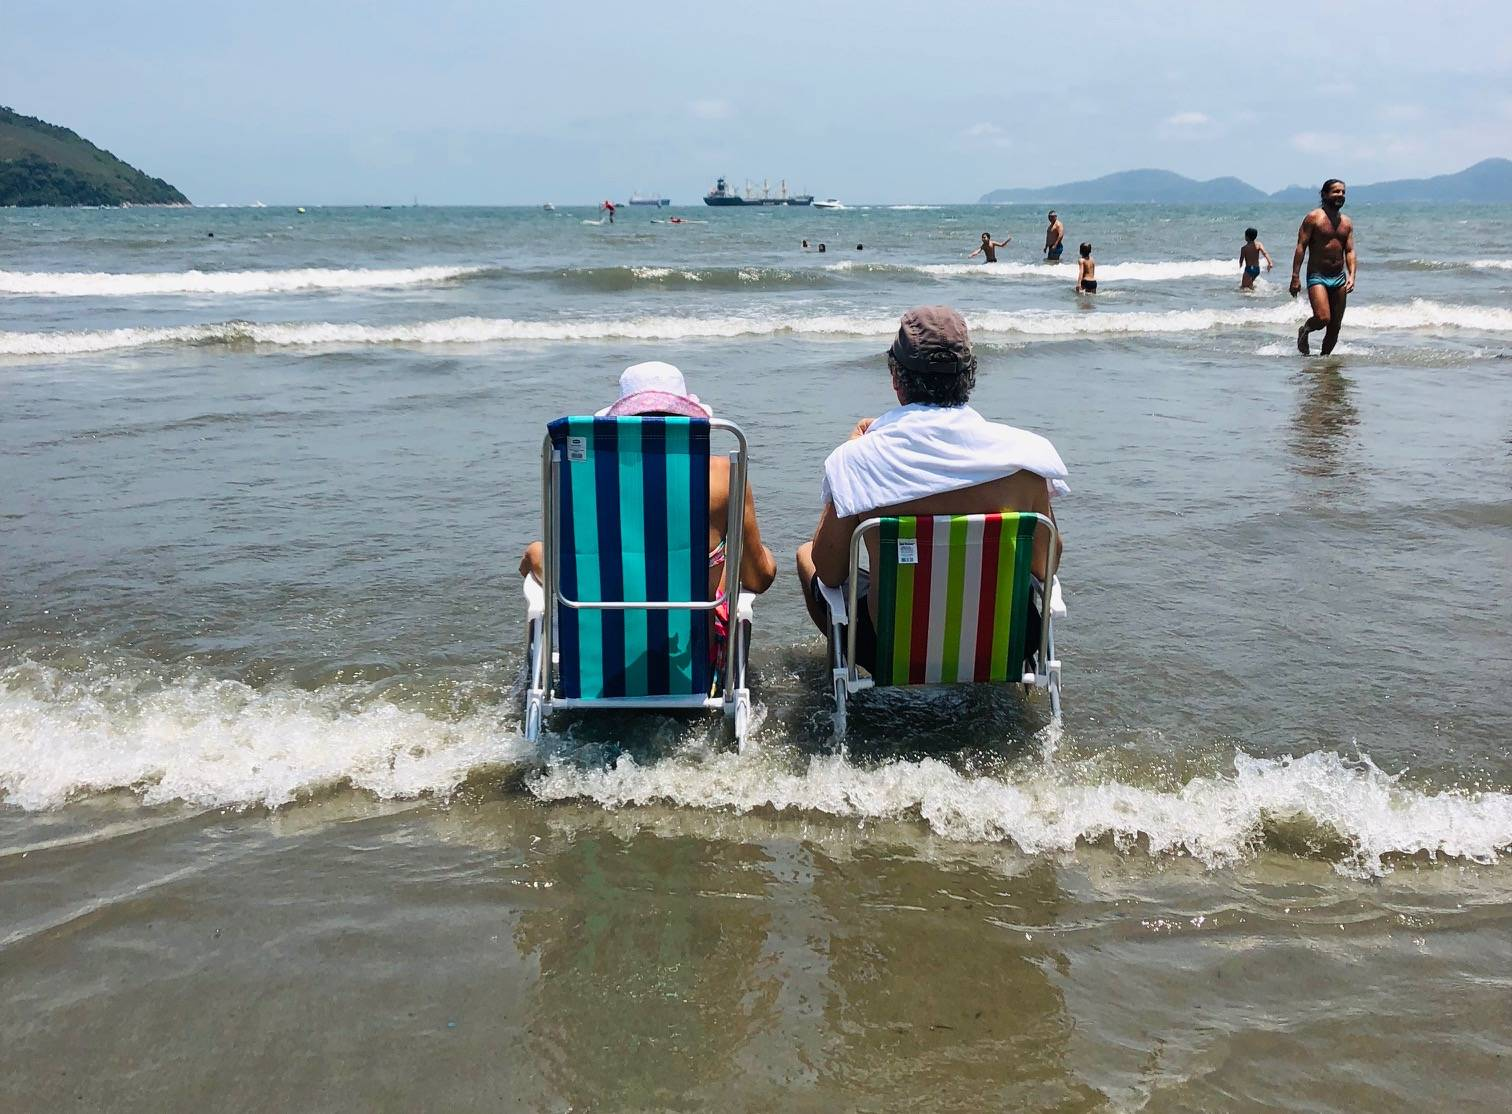 www.juicysantos.com.br - icuidados com idosos no calor de santos